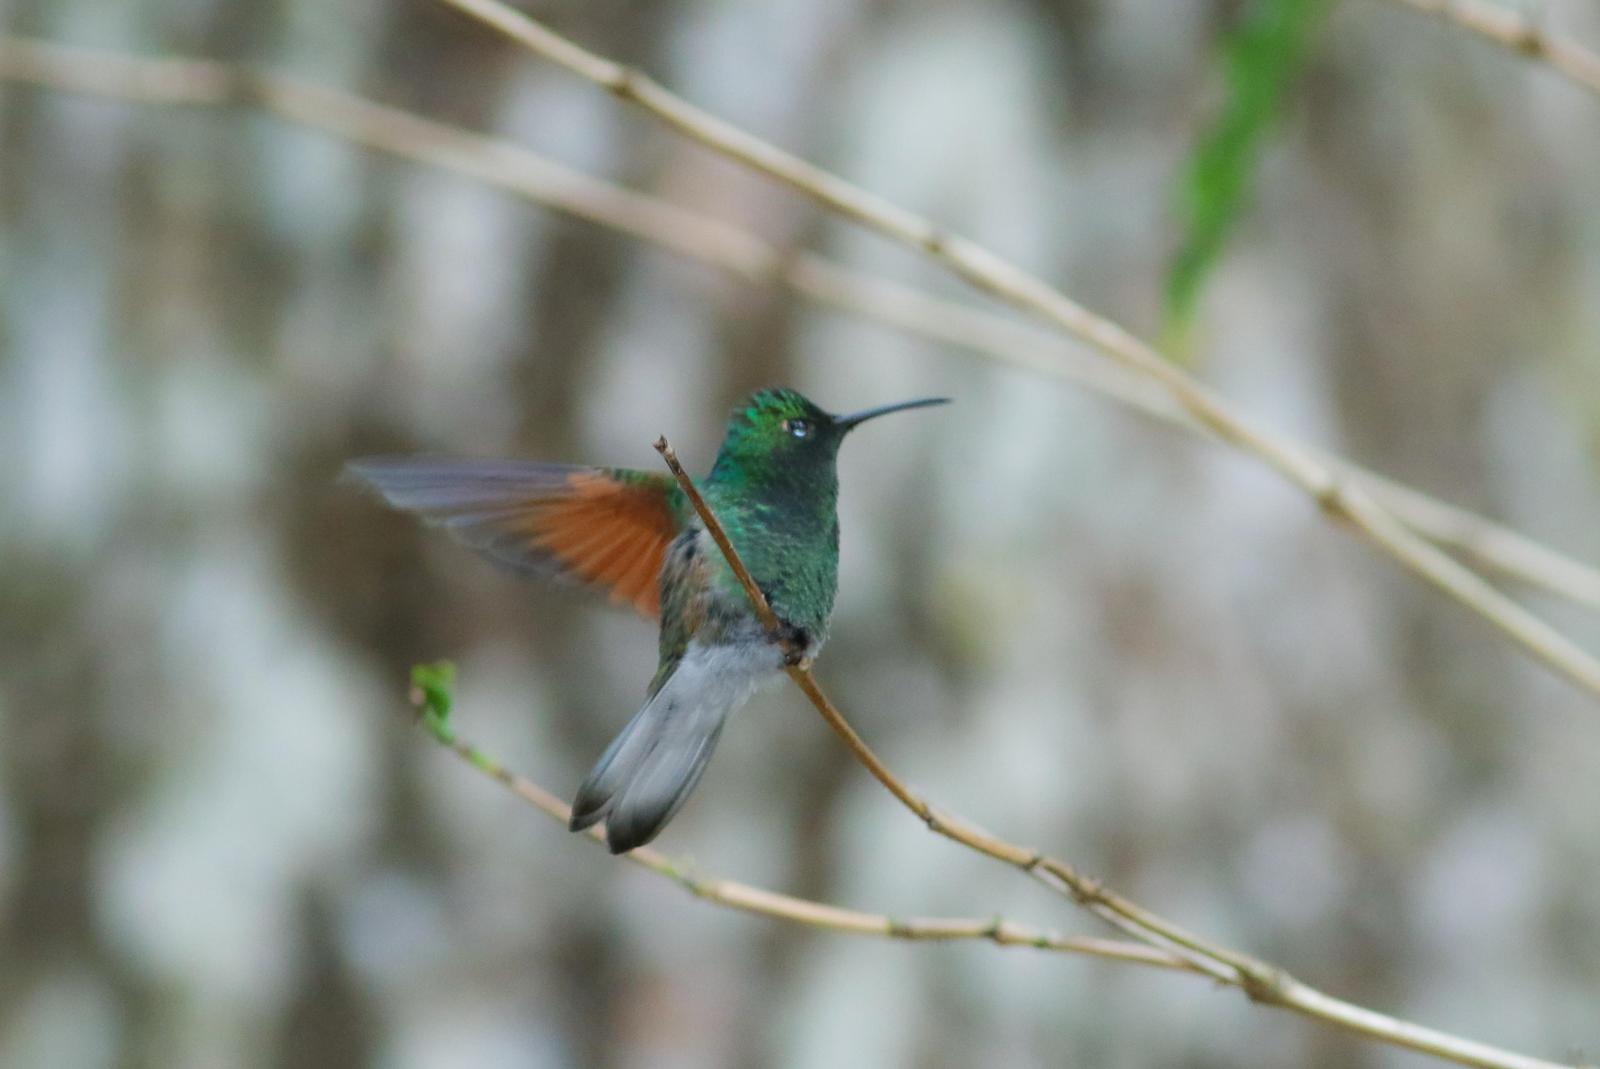 White-tailed Hummingbird Photo by Leonardo Garrigues